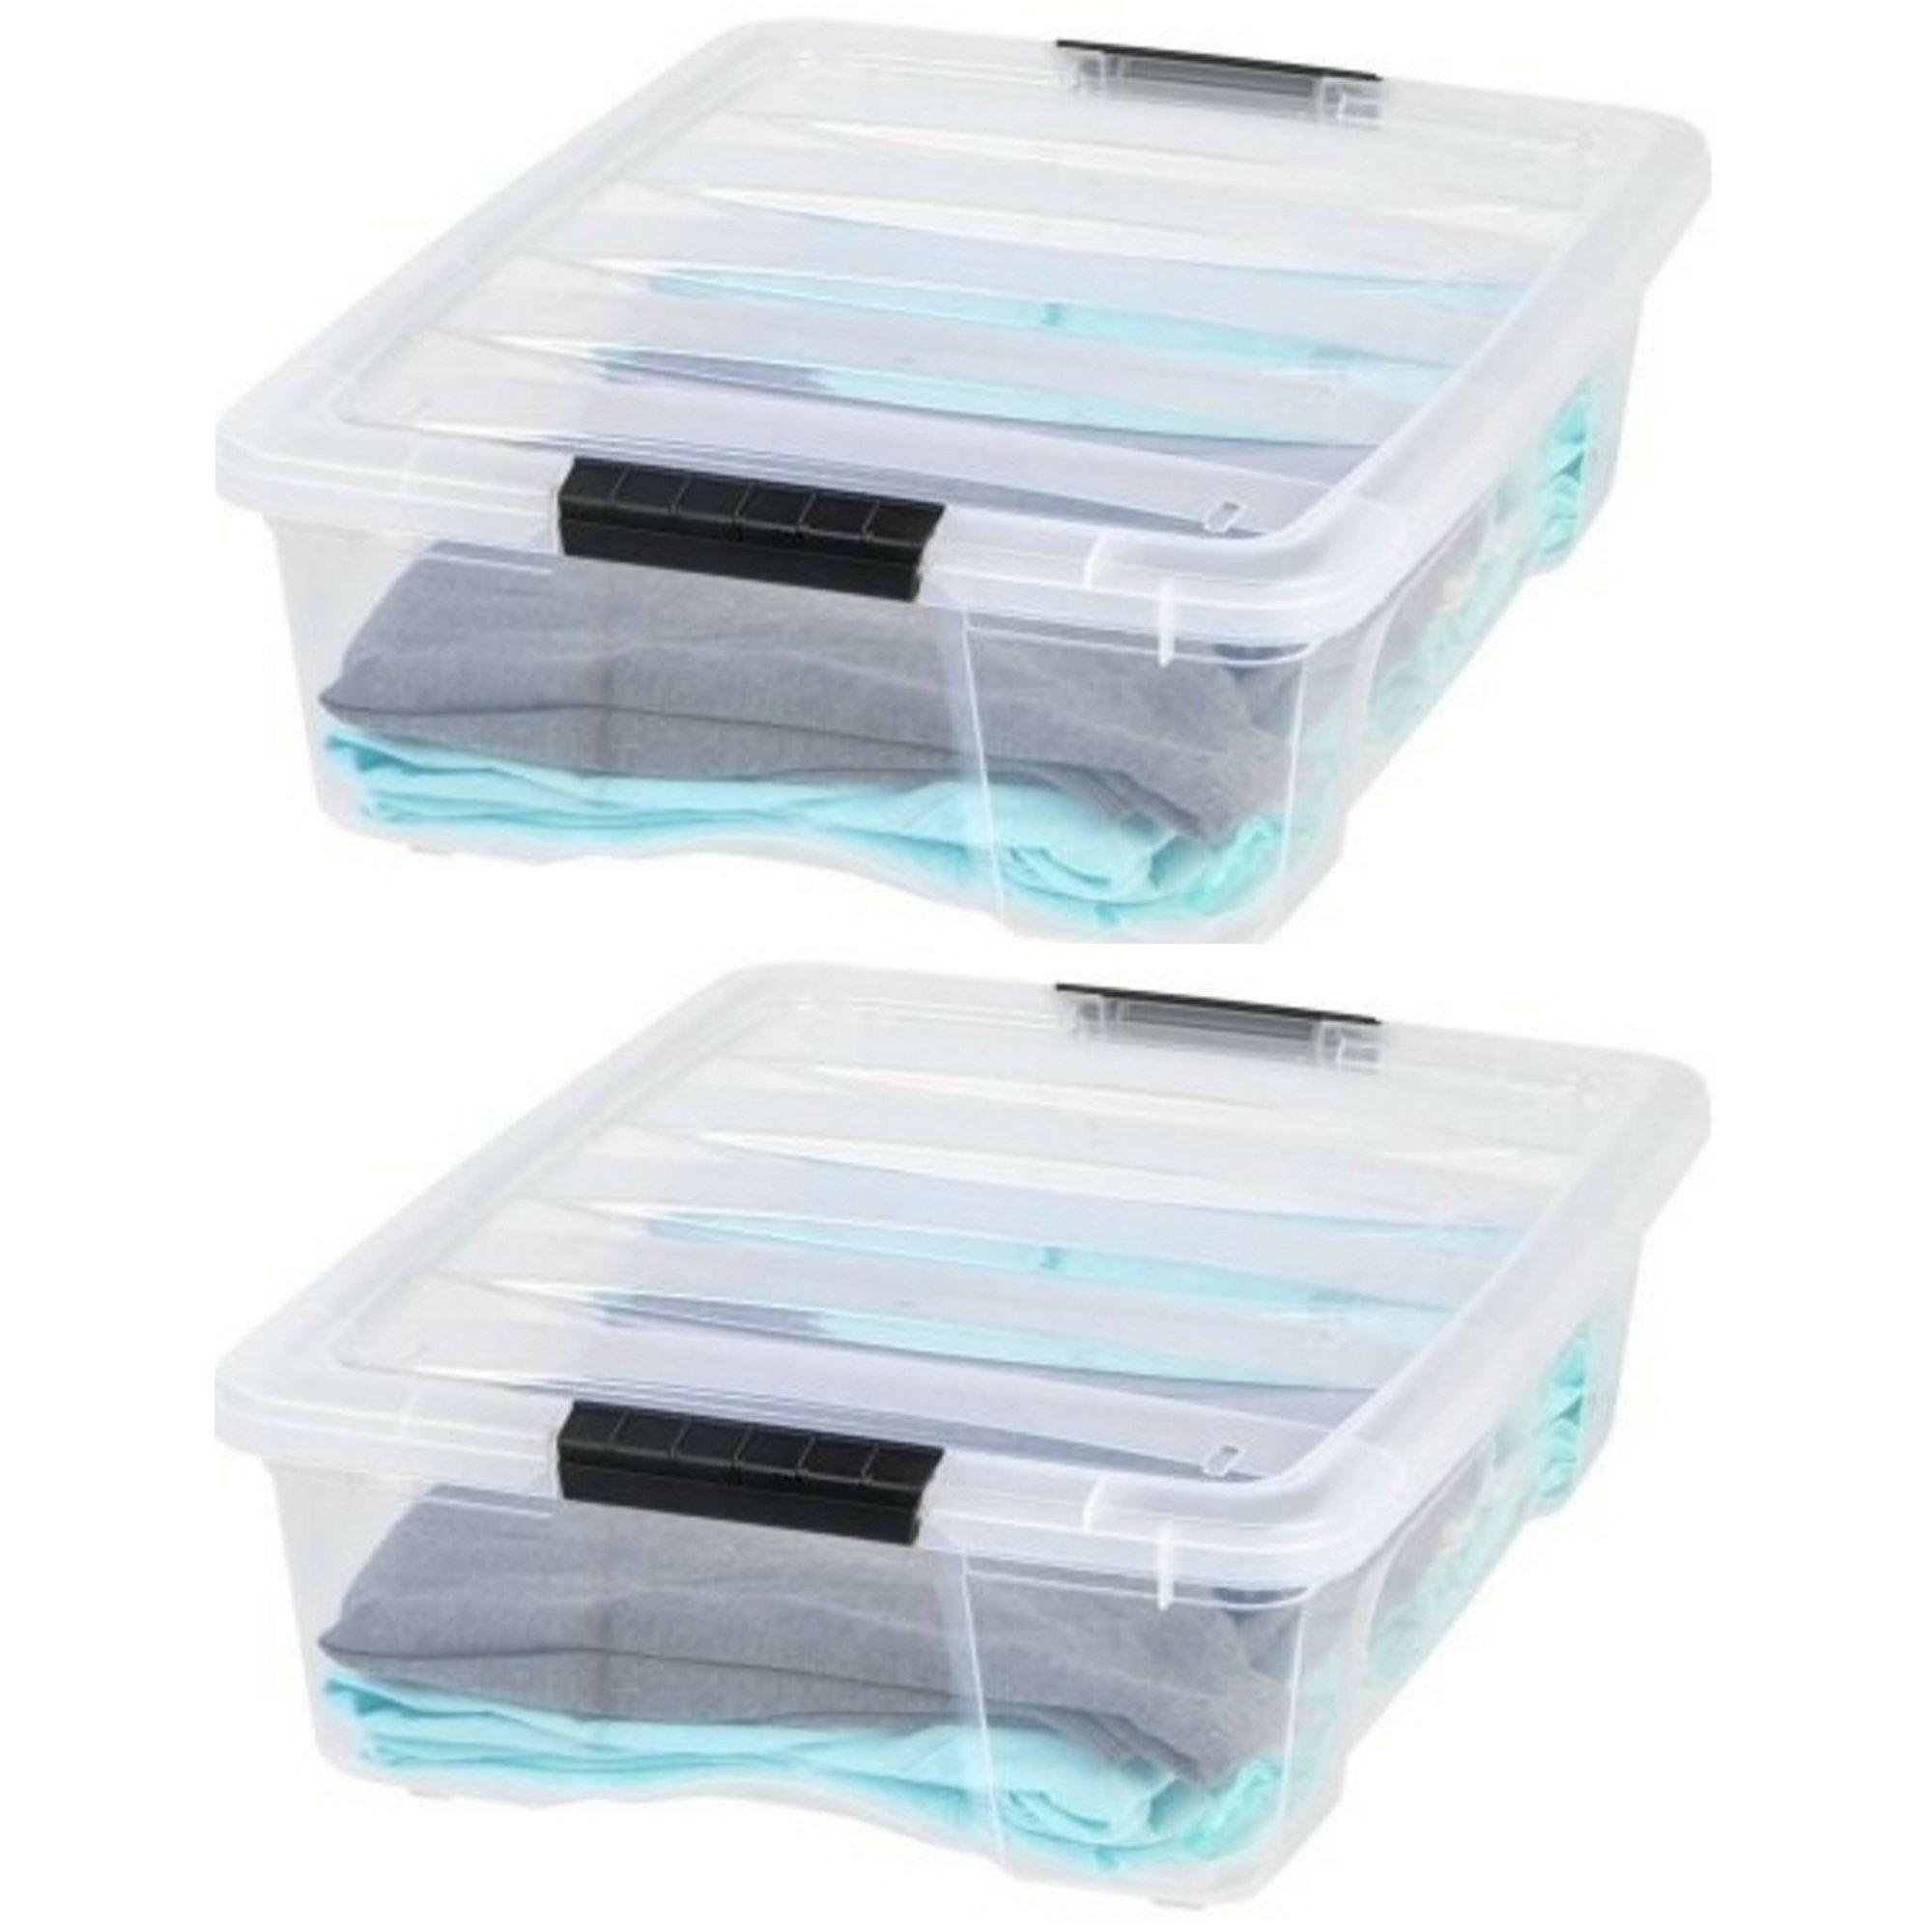 IRIS 26 Quart Stack & Pull Box, Clear (2 Pack)